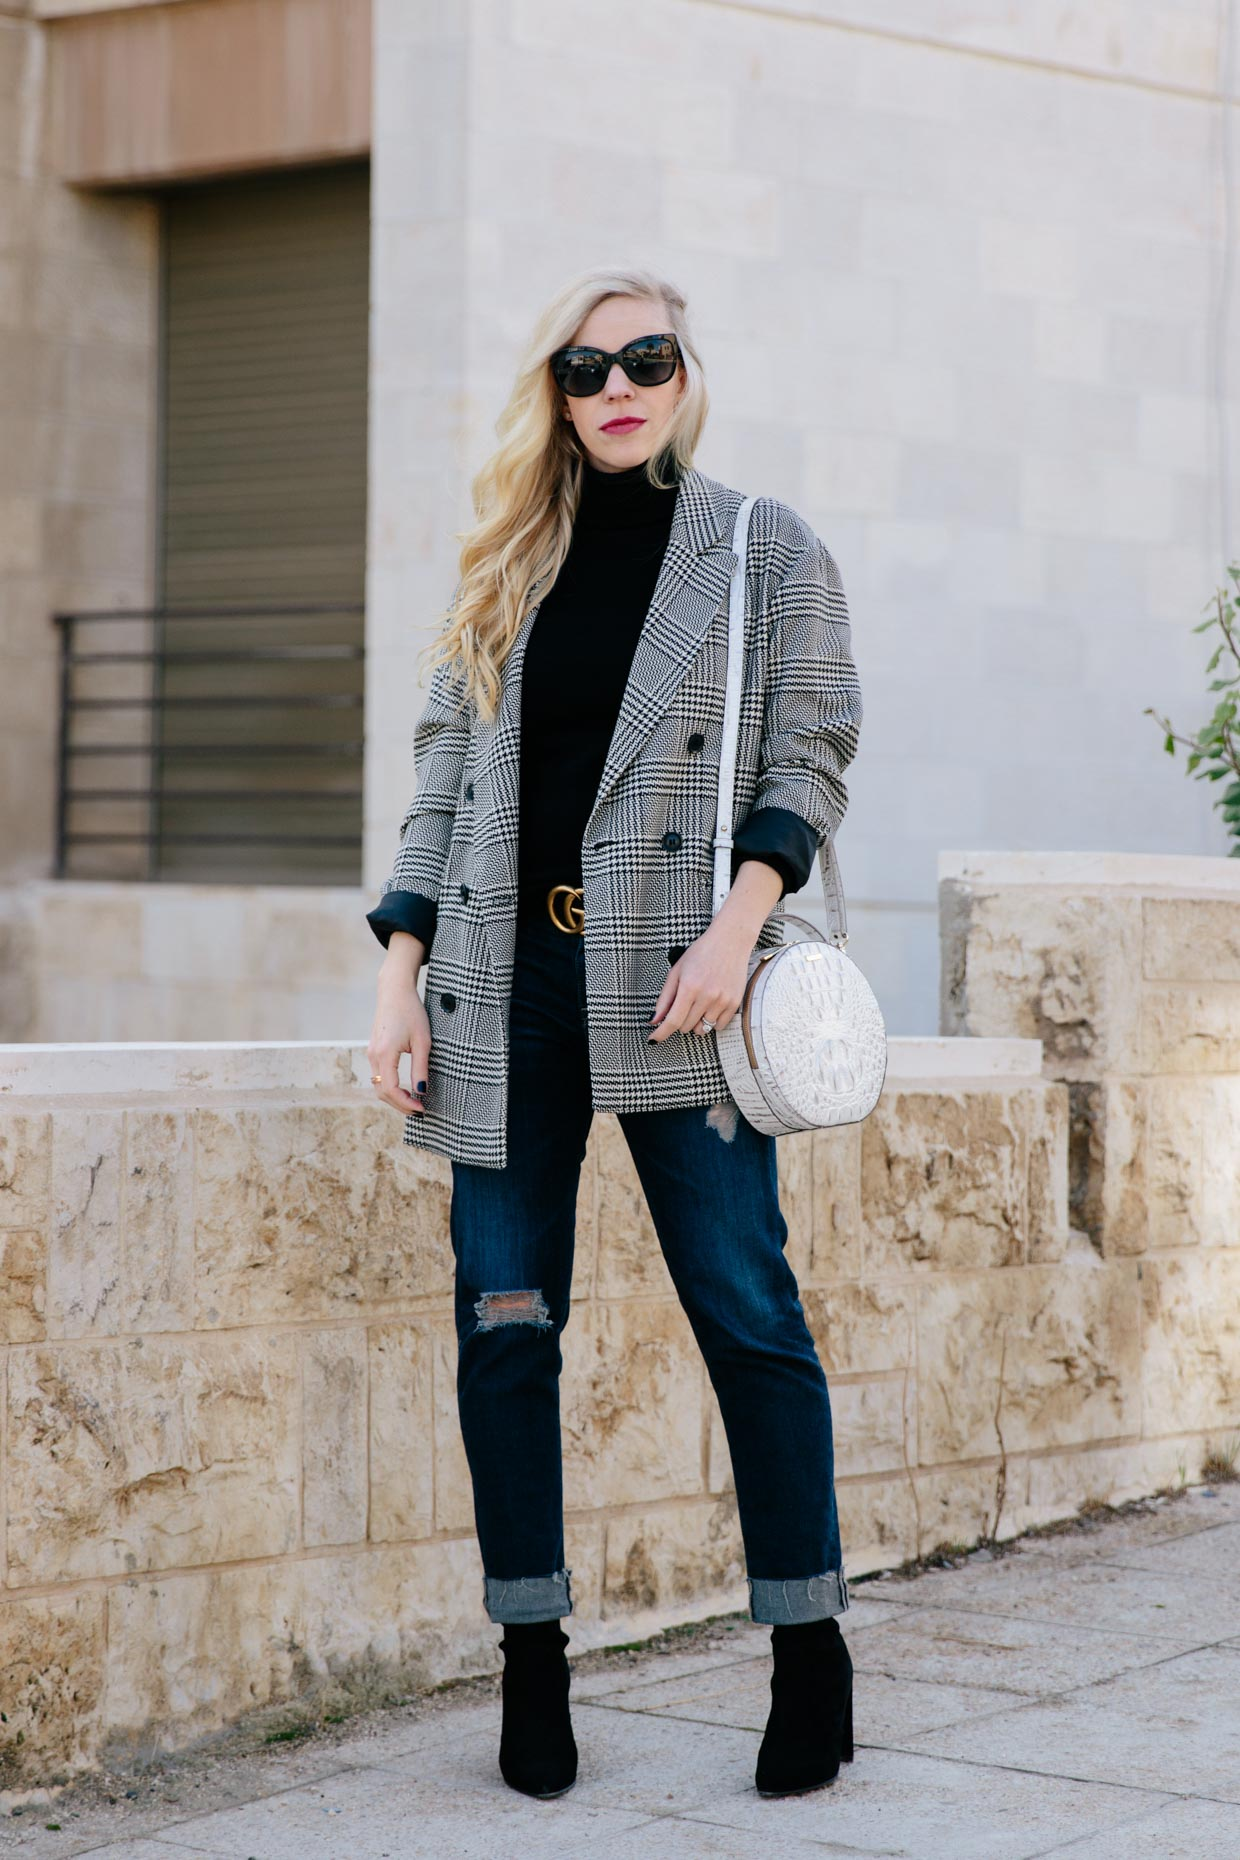 9902299ce0d Meagan Brandon fashion blogger of Meagan s Moda wears oversized menswear  checked blazer with distressed boyfriend jeans